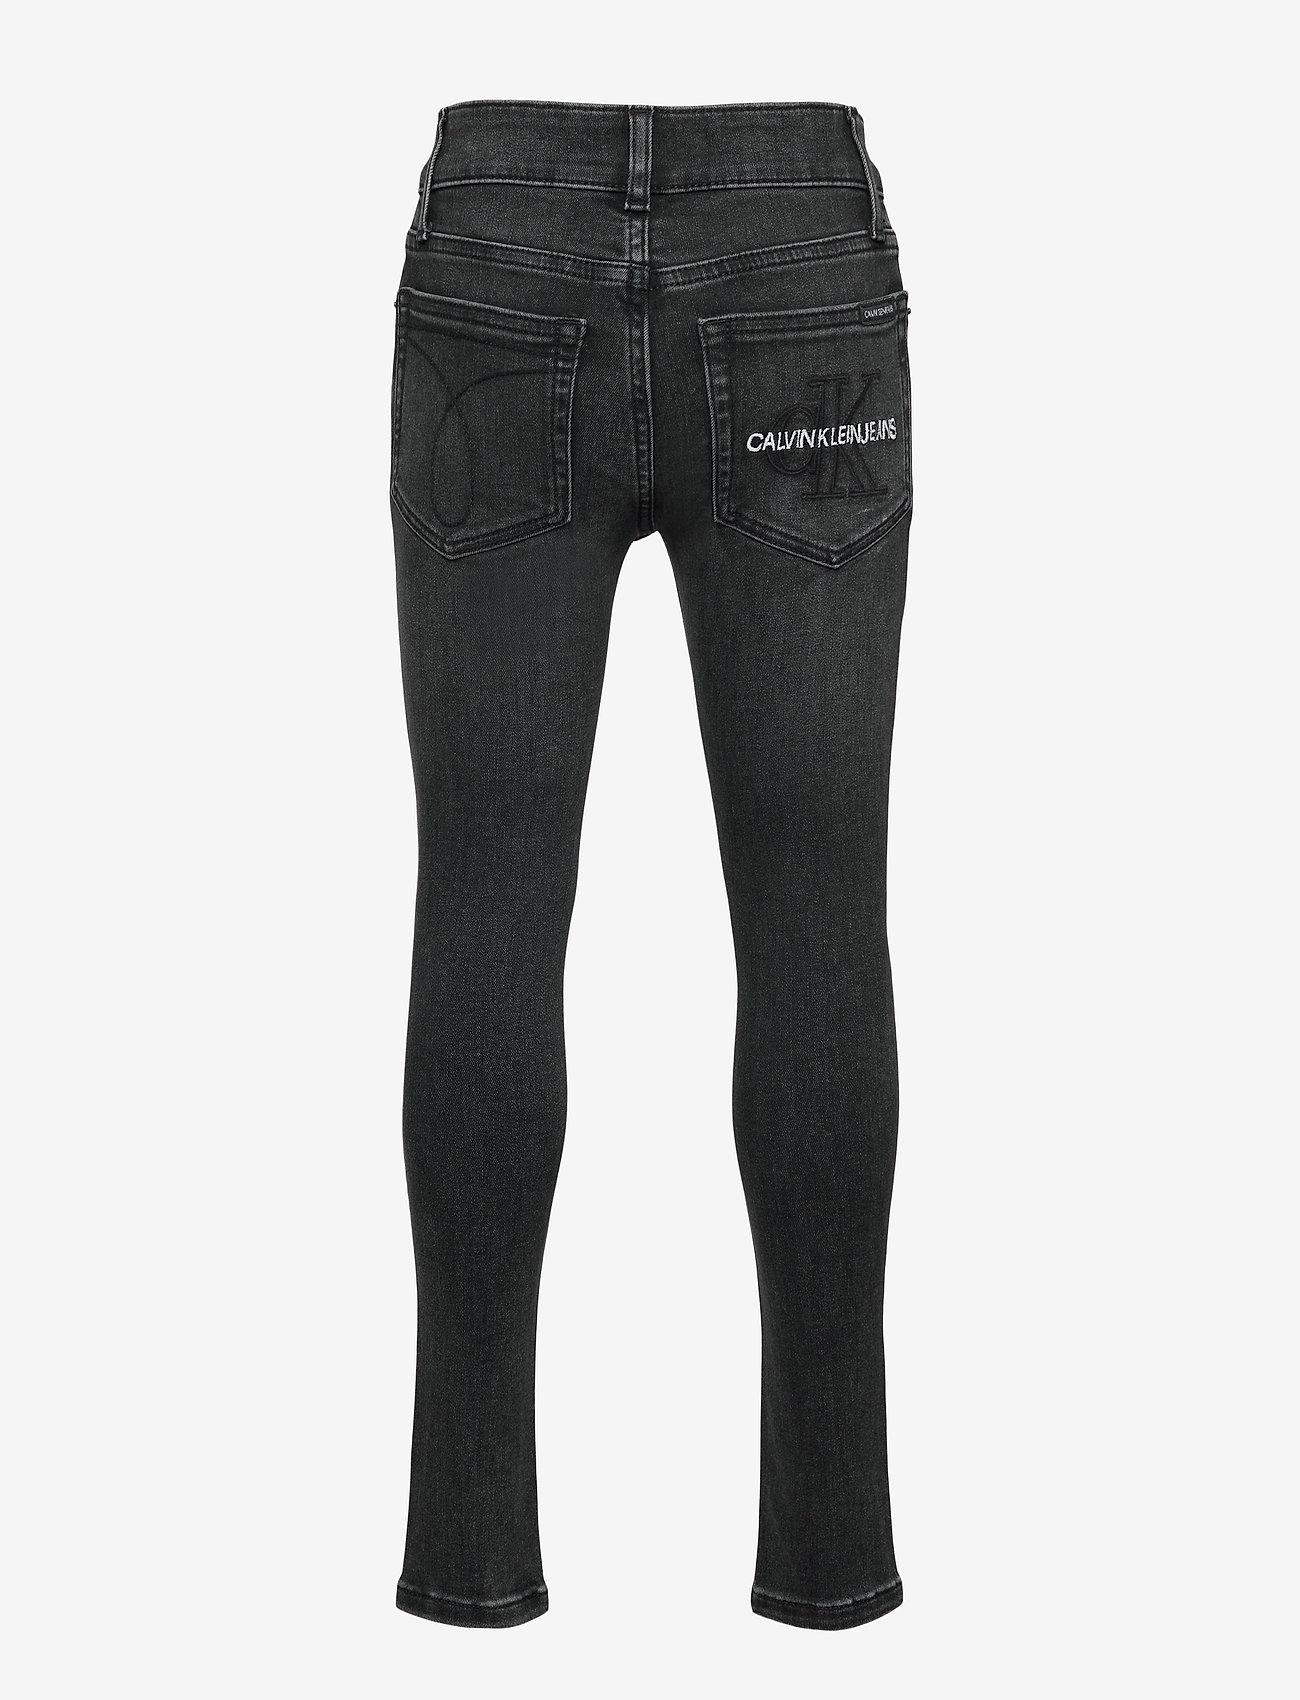 Calvin Klein - SUPER SKINNY MONOGRAM BLK STR - jeans - monogram black stretch - 1